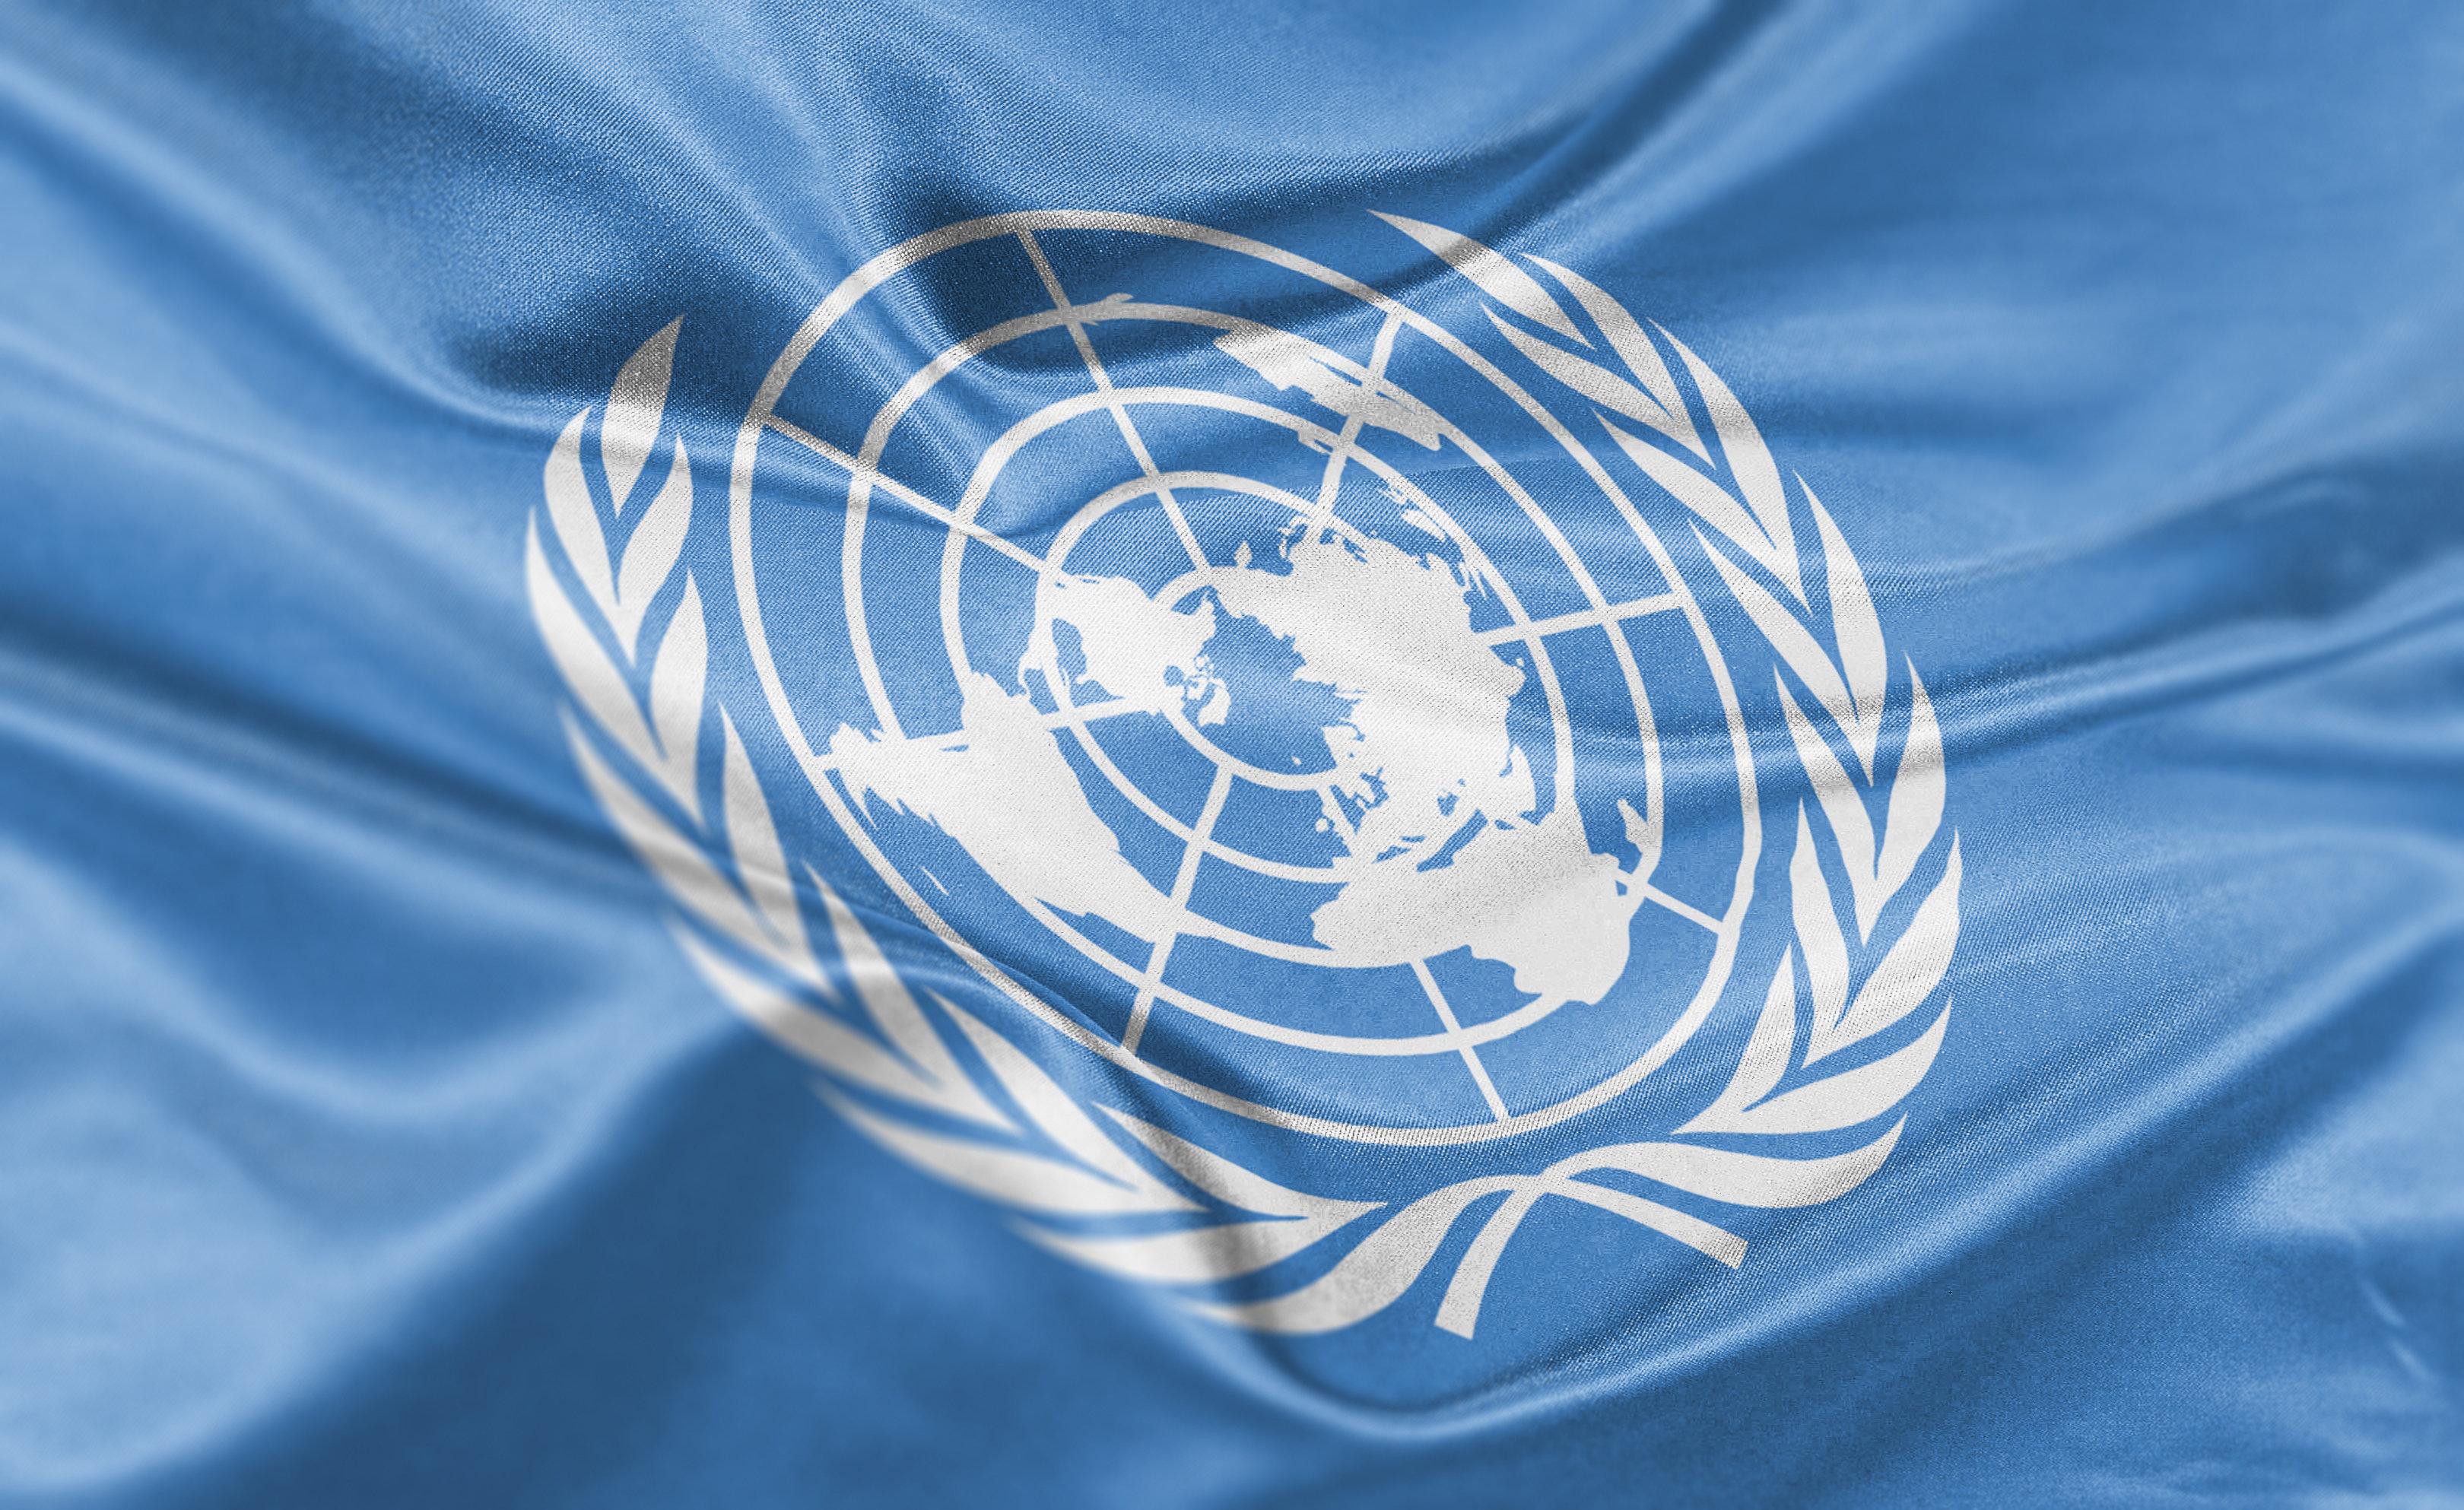 High resolution digital render of United Nations flag.